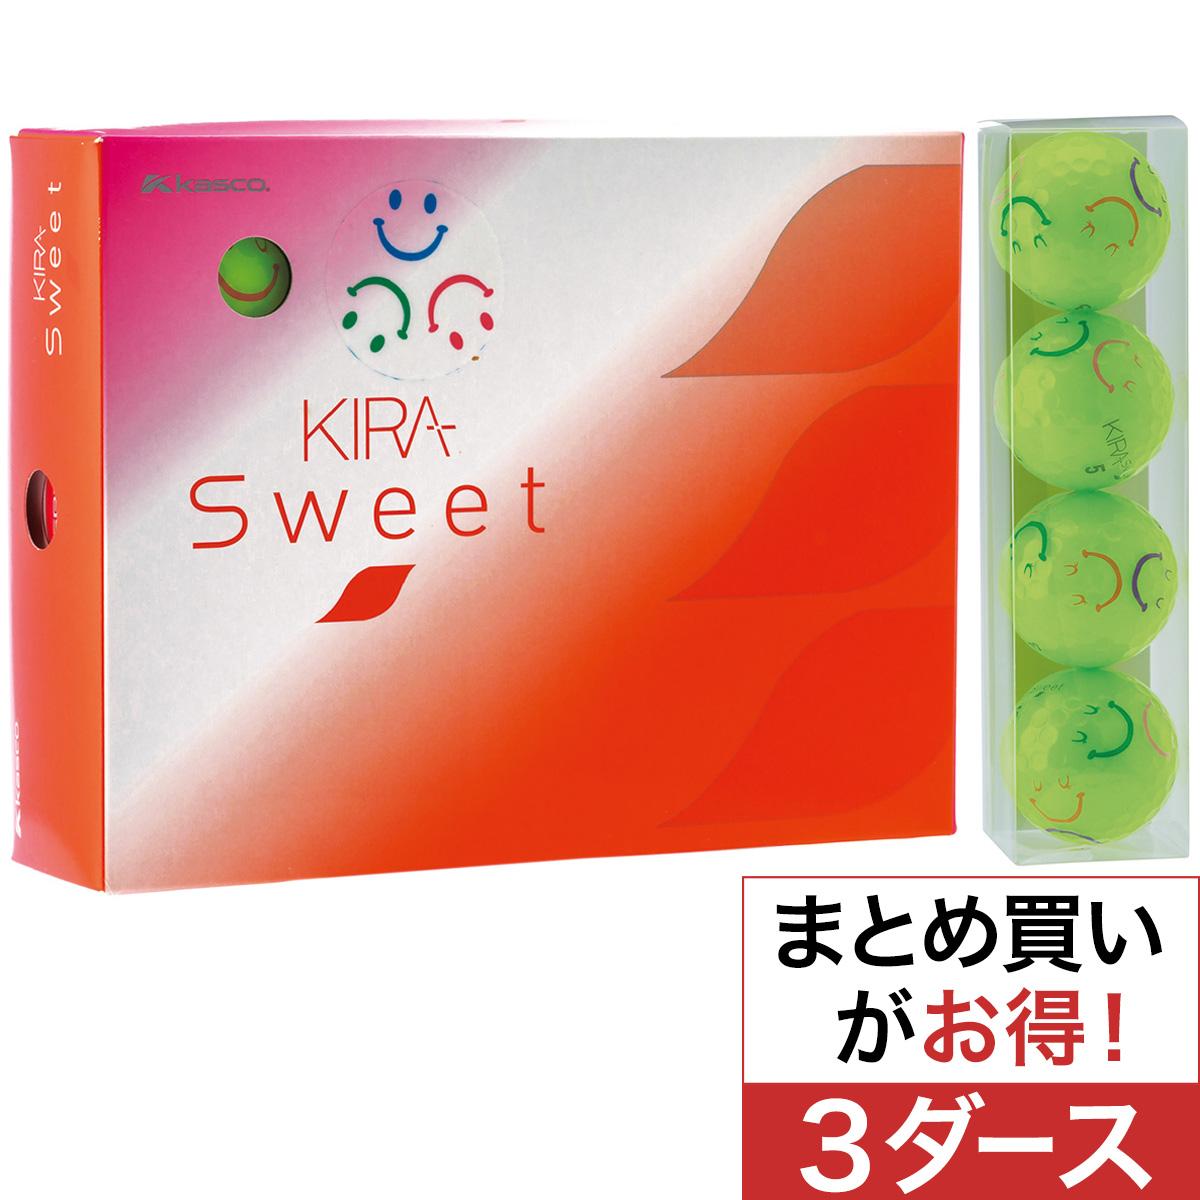 KIRA SWEET フルキャラボール 3ダースセットレディス